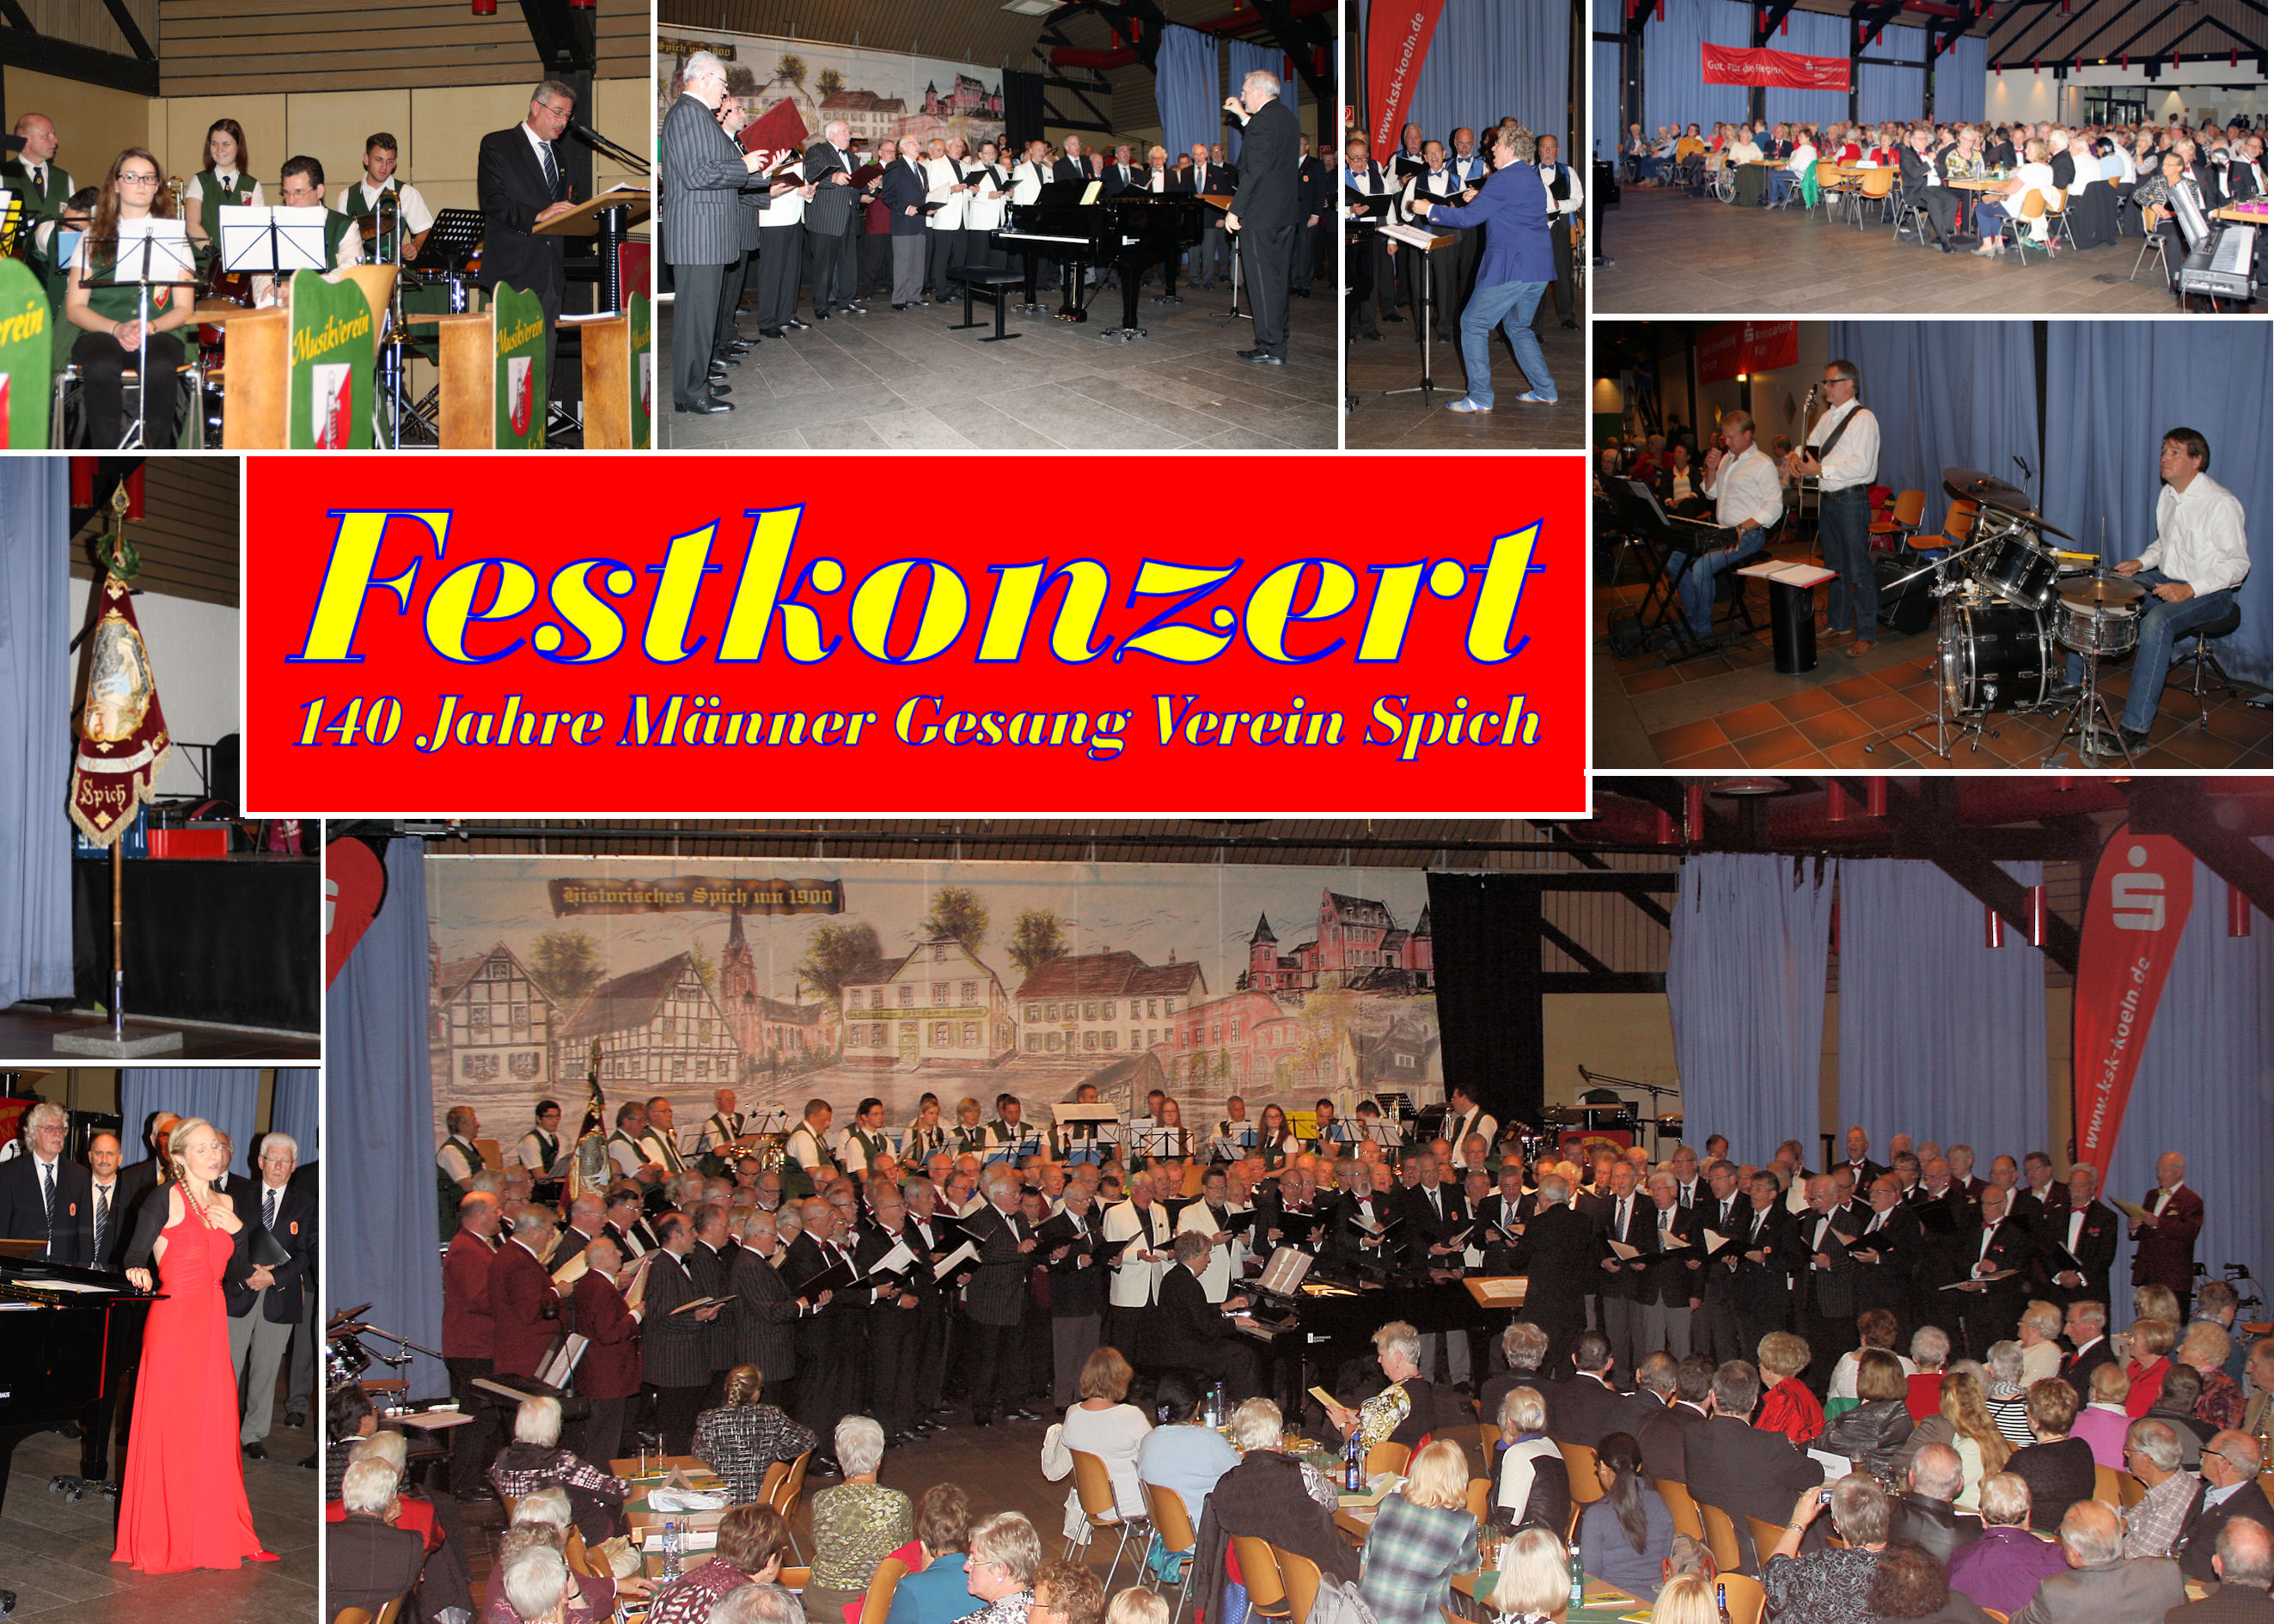 2014.10.25 MGV Festkonzert (Montage)